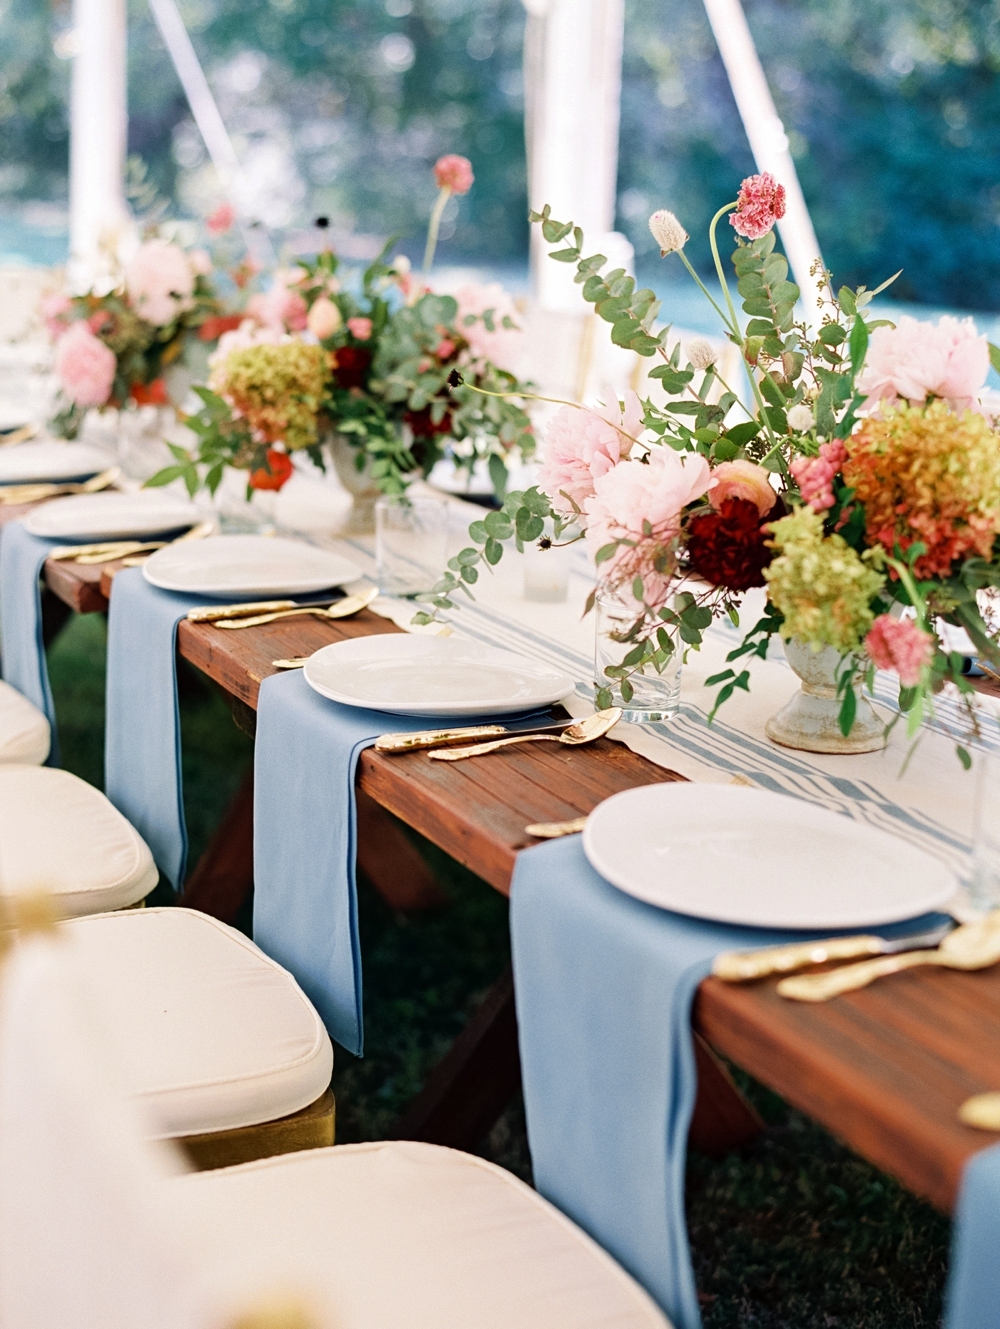 Dallas Wedding Designer and Planner Lindsey Zamora